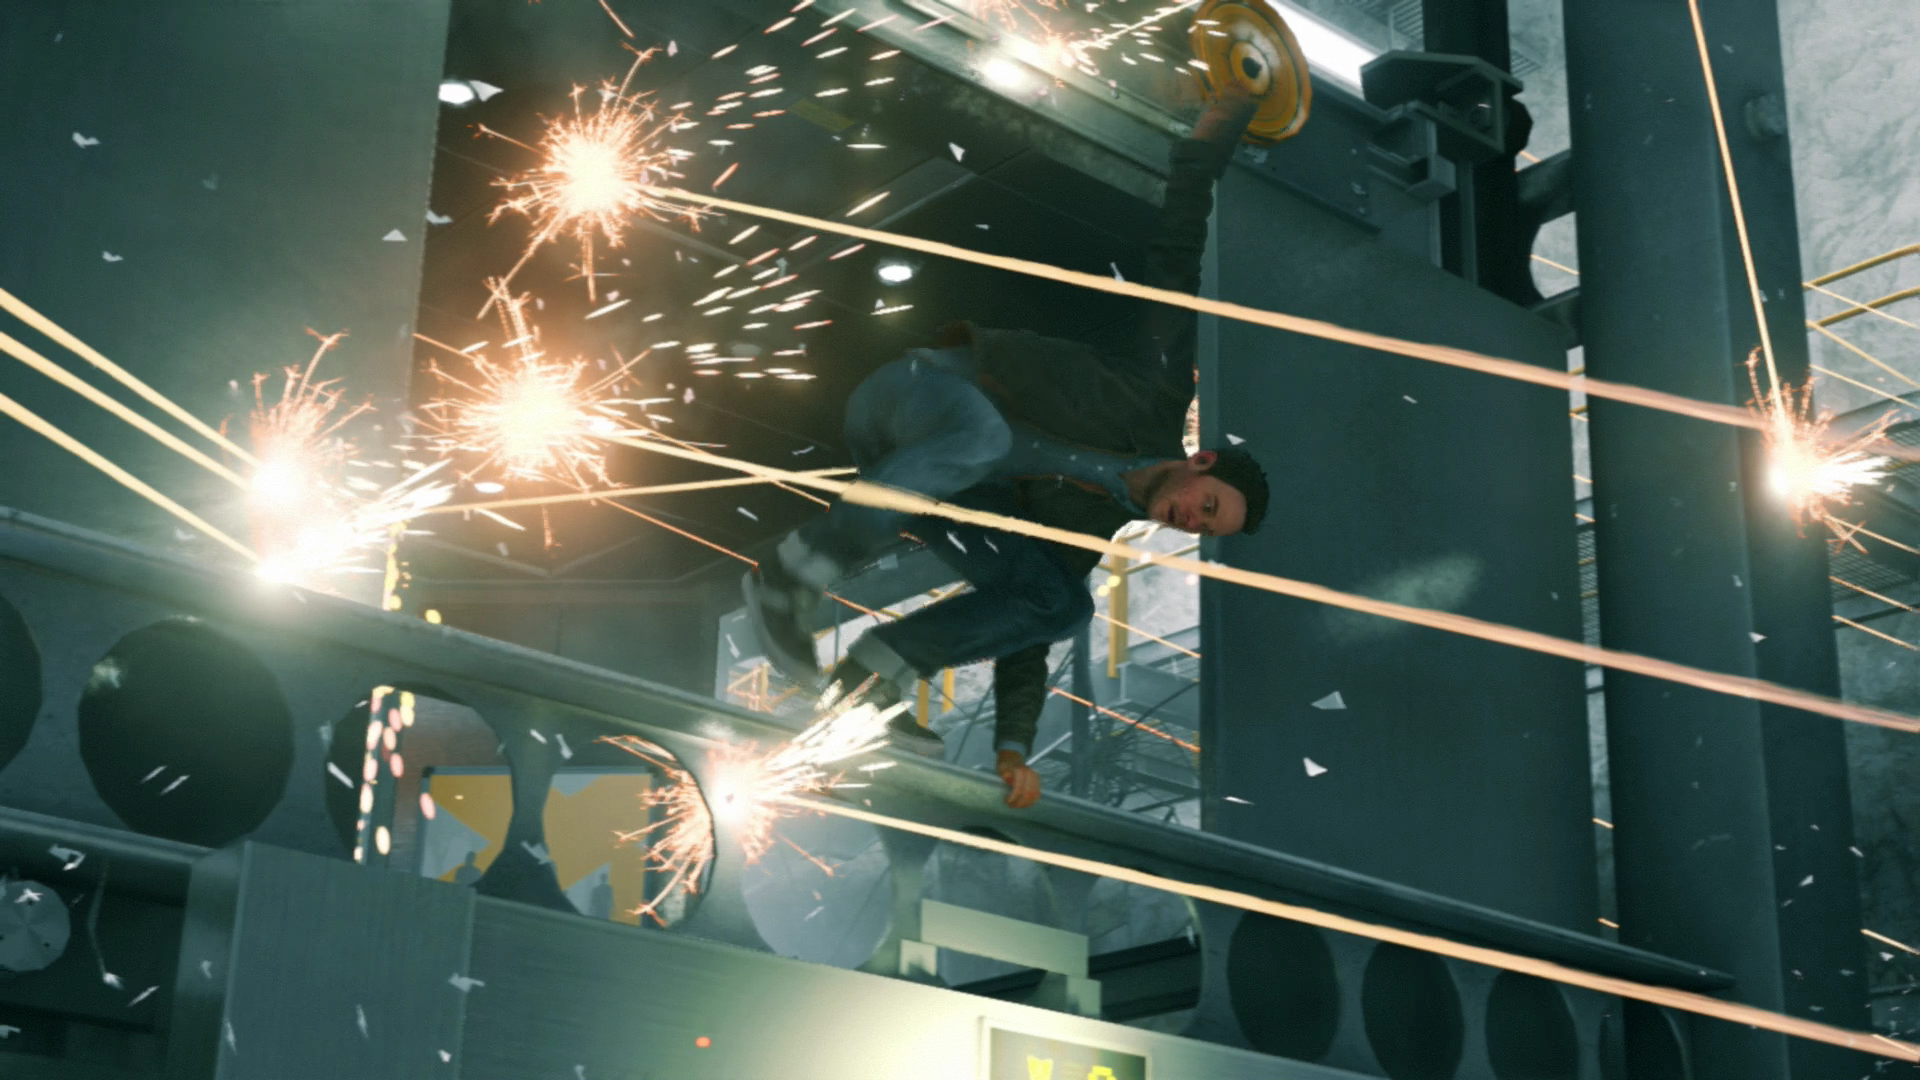 Quantum Break Screen Shot 11.04.16 18.14 2 - Quantum Break Screen Shot 11.04.16, 18.14-2